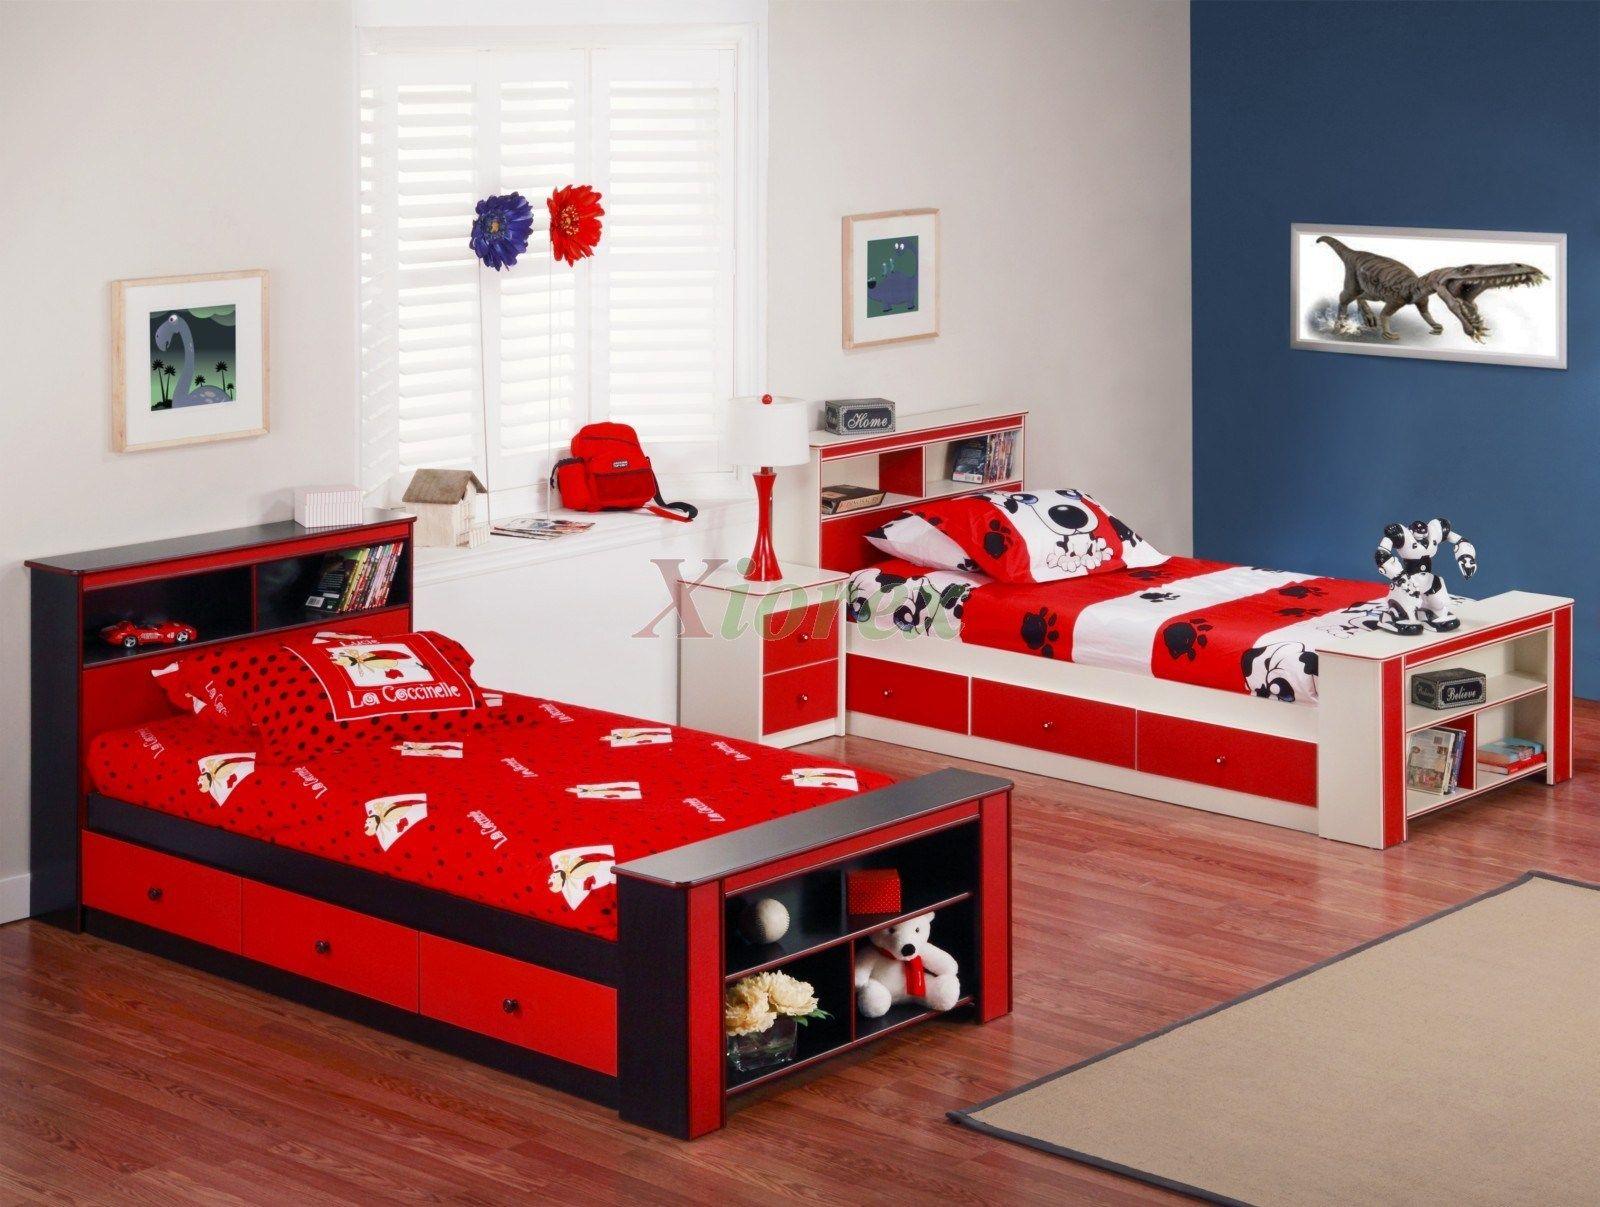 30 Wonderful Image Of Kids Bedroom Furniture Boys